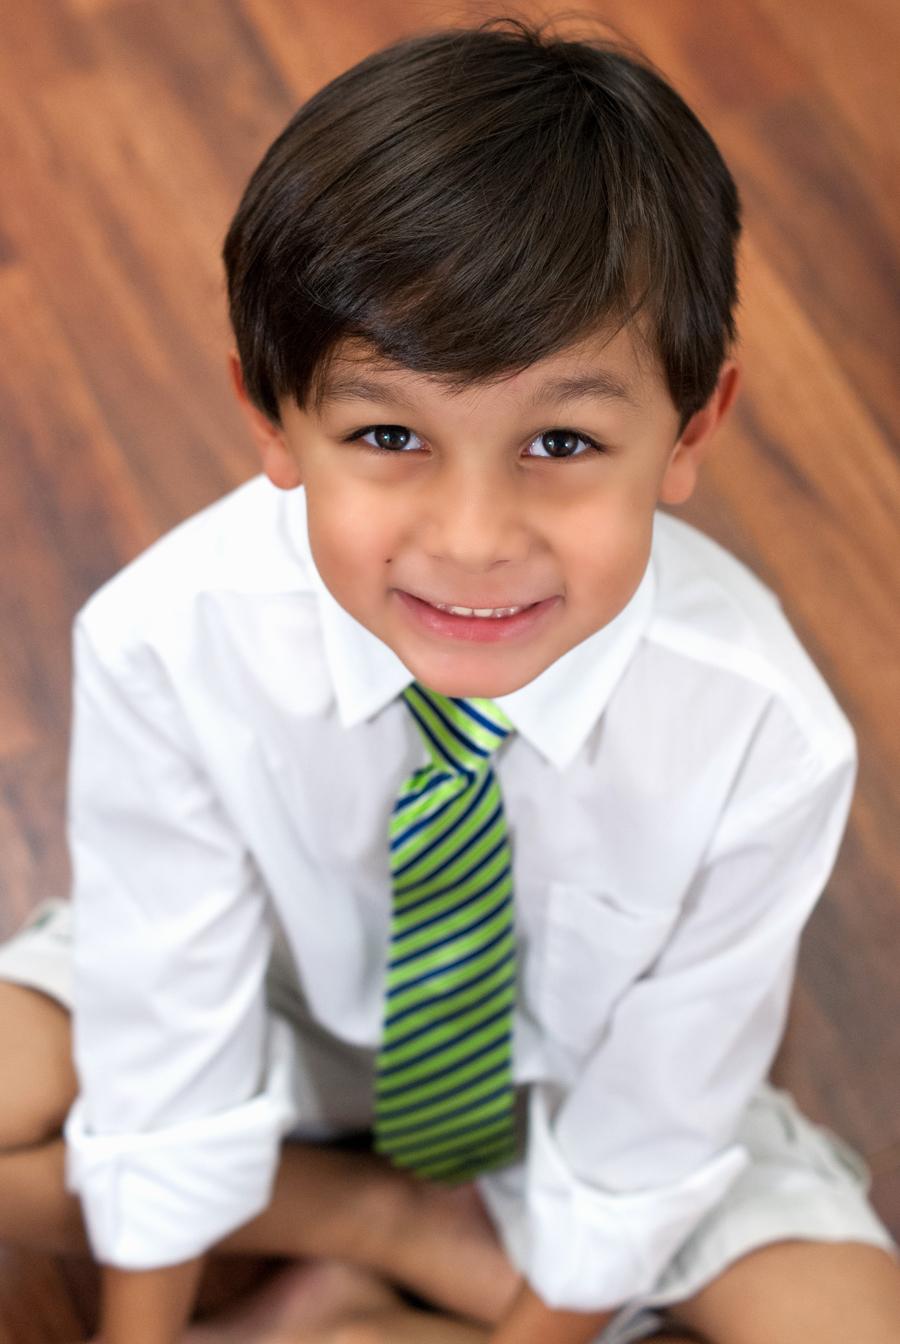 striped green tie